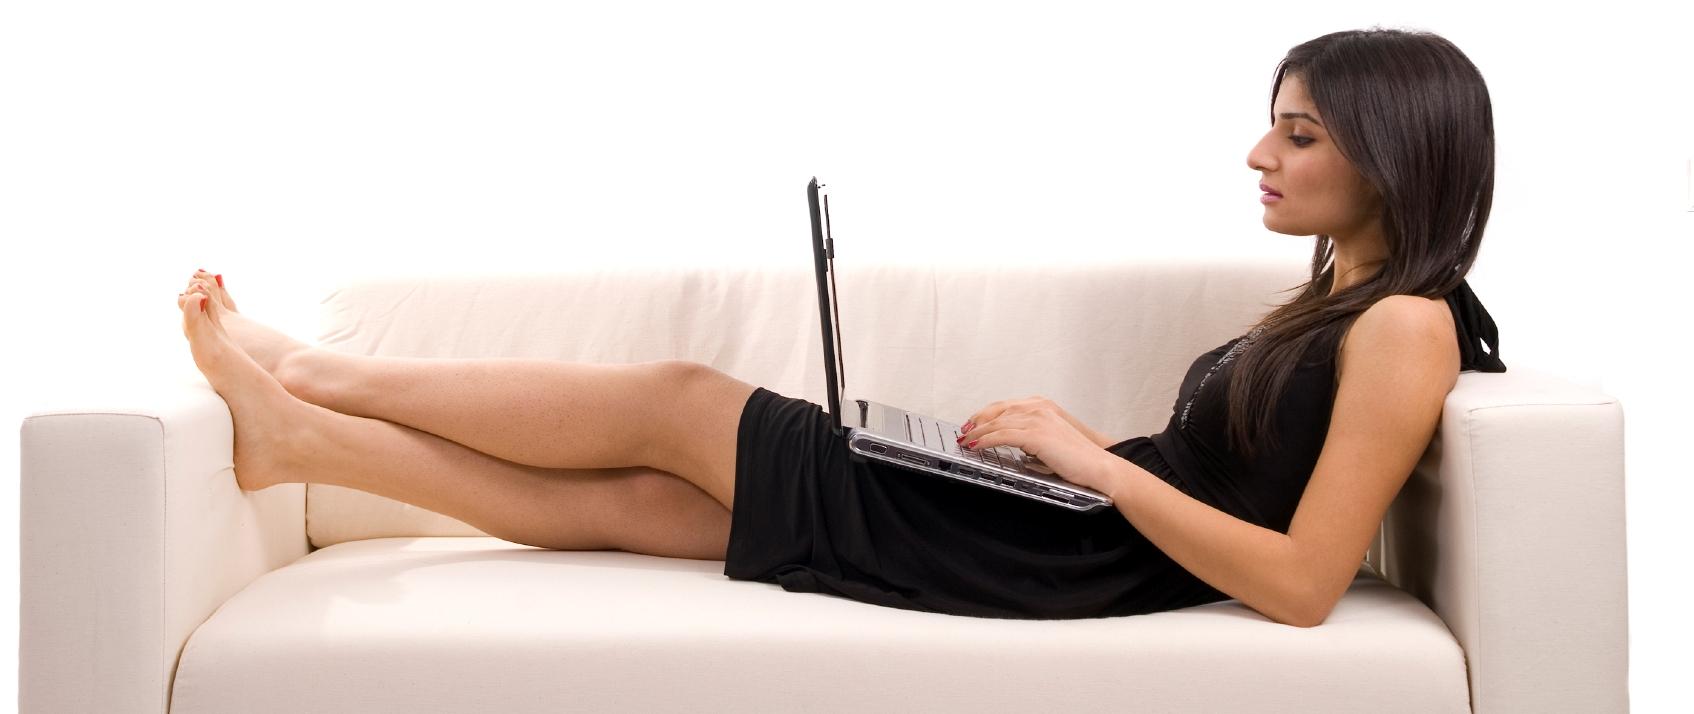 online counceling